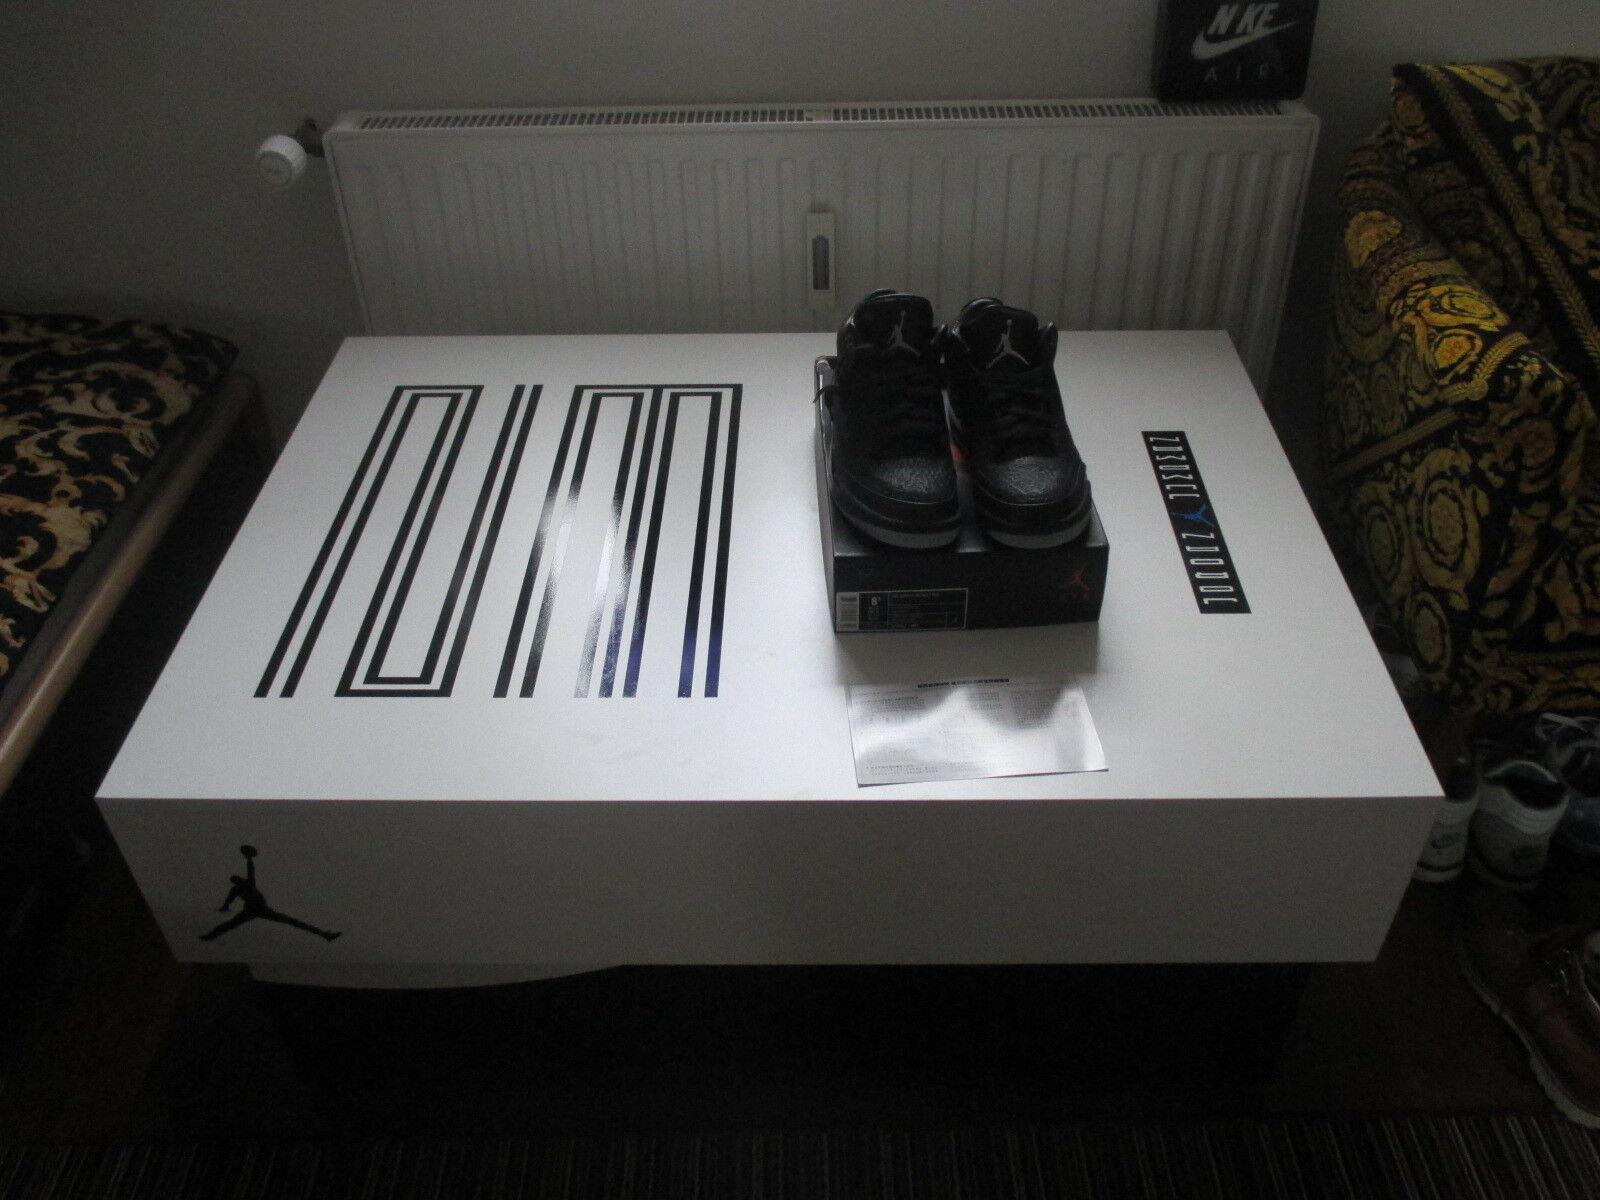 Nike Air Jordan Retro 3 Flip, Doernbecher, 42, nuevo, miedo, BHM, Doernbecher, Flip, cemento, criados, Ovo, yezzyqs marca de descuento 3d421a